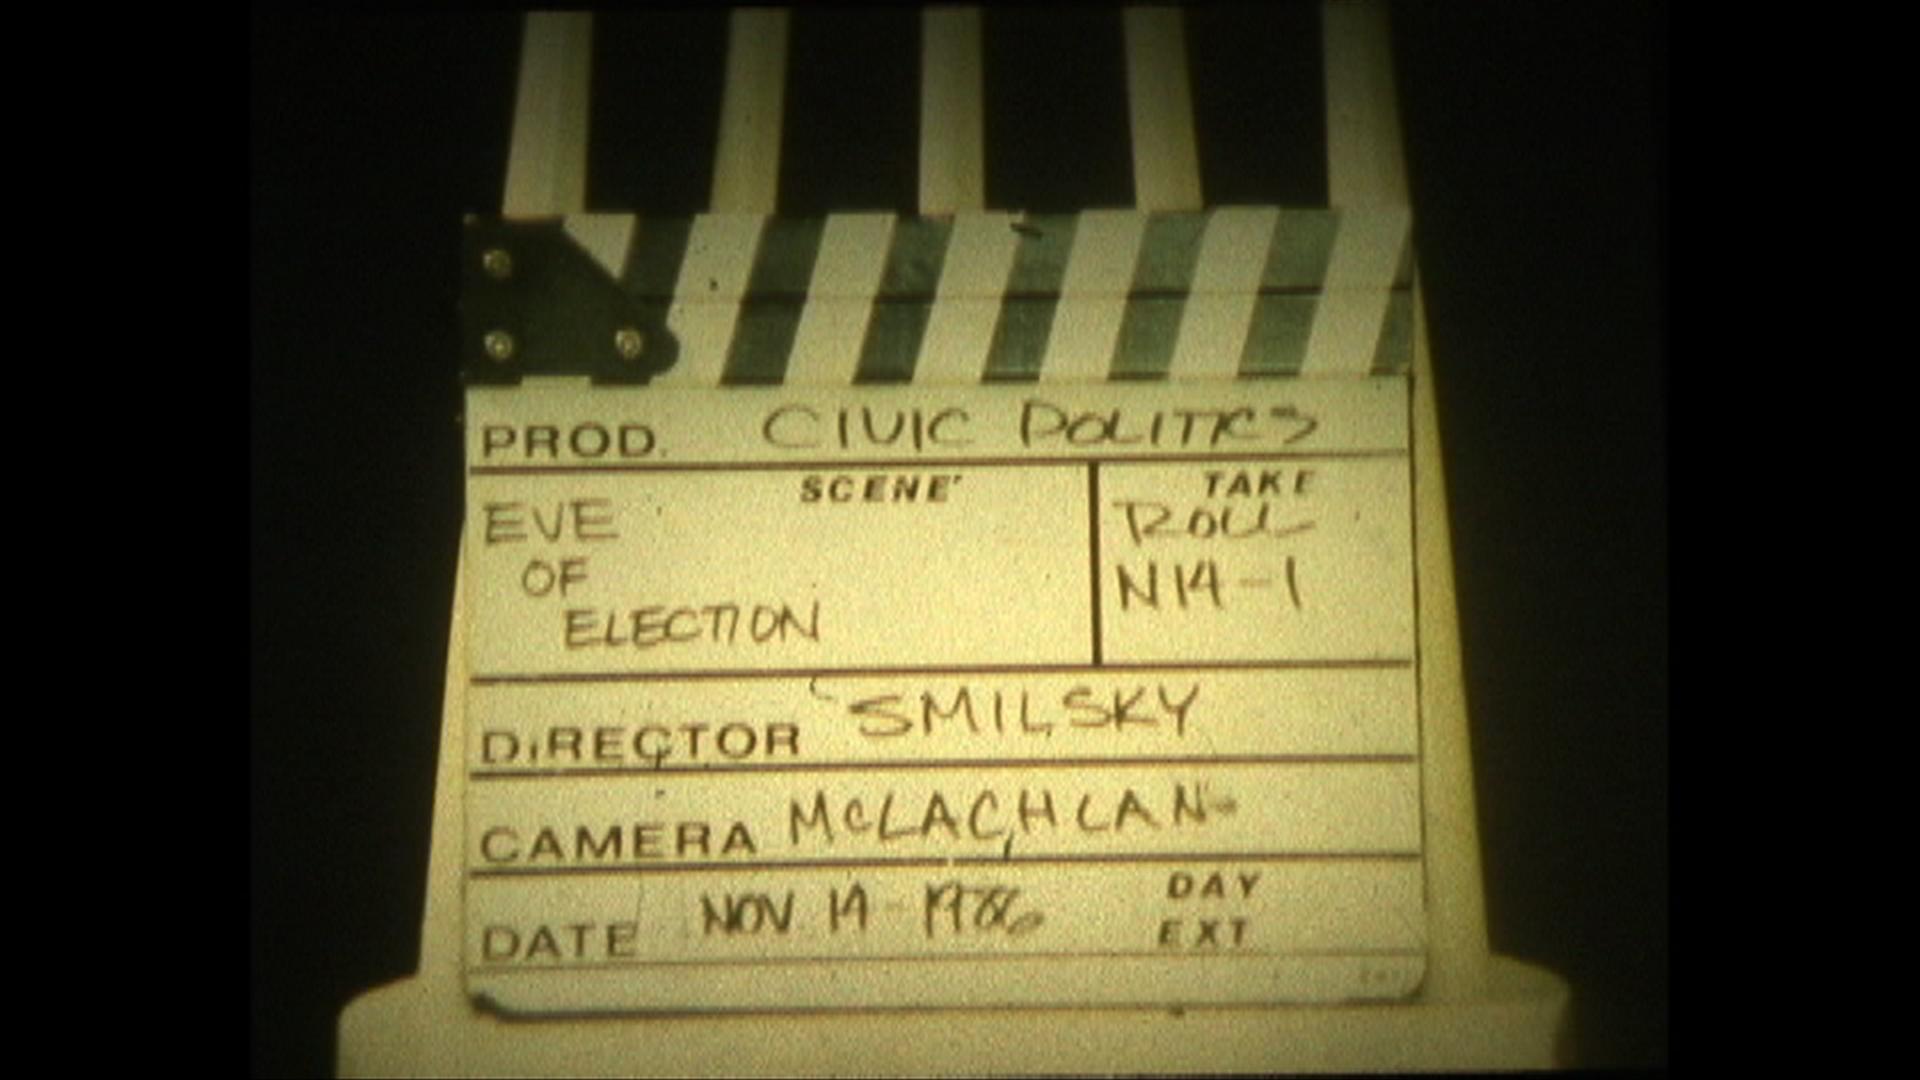 Slate from director Peter Smilksy's original film shoot in 1986.